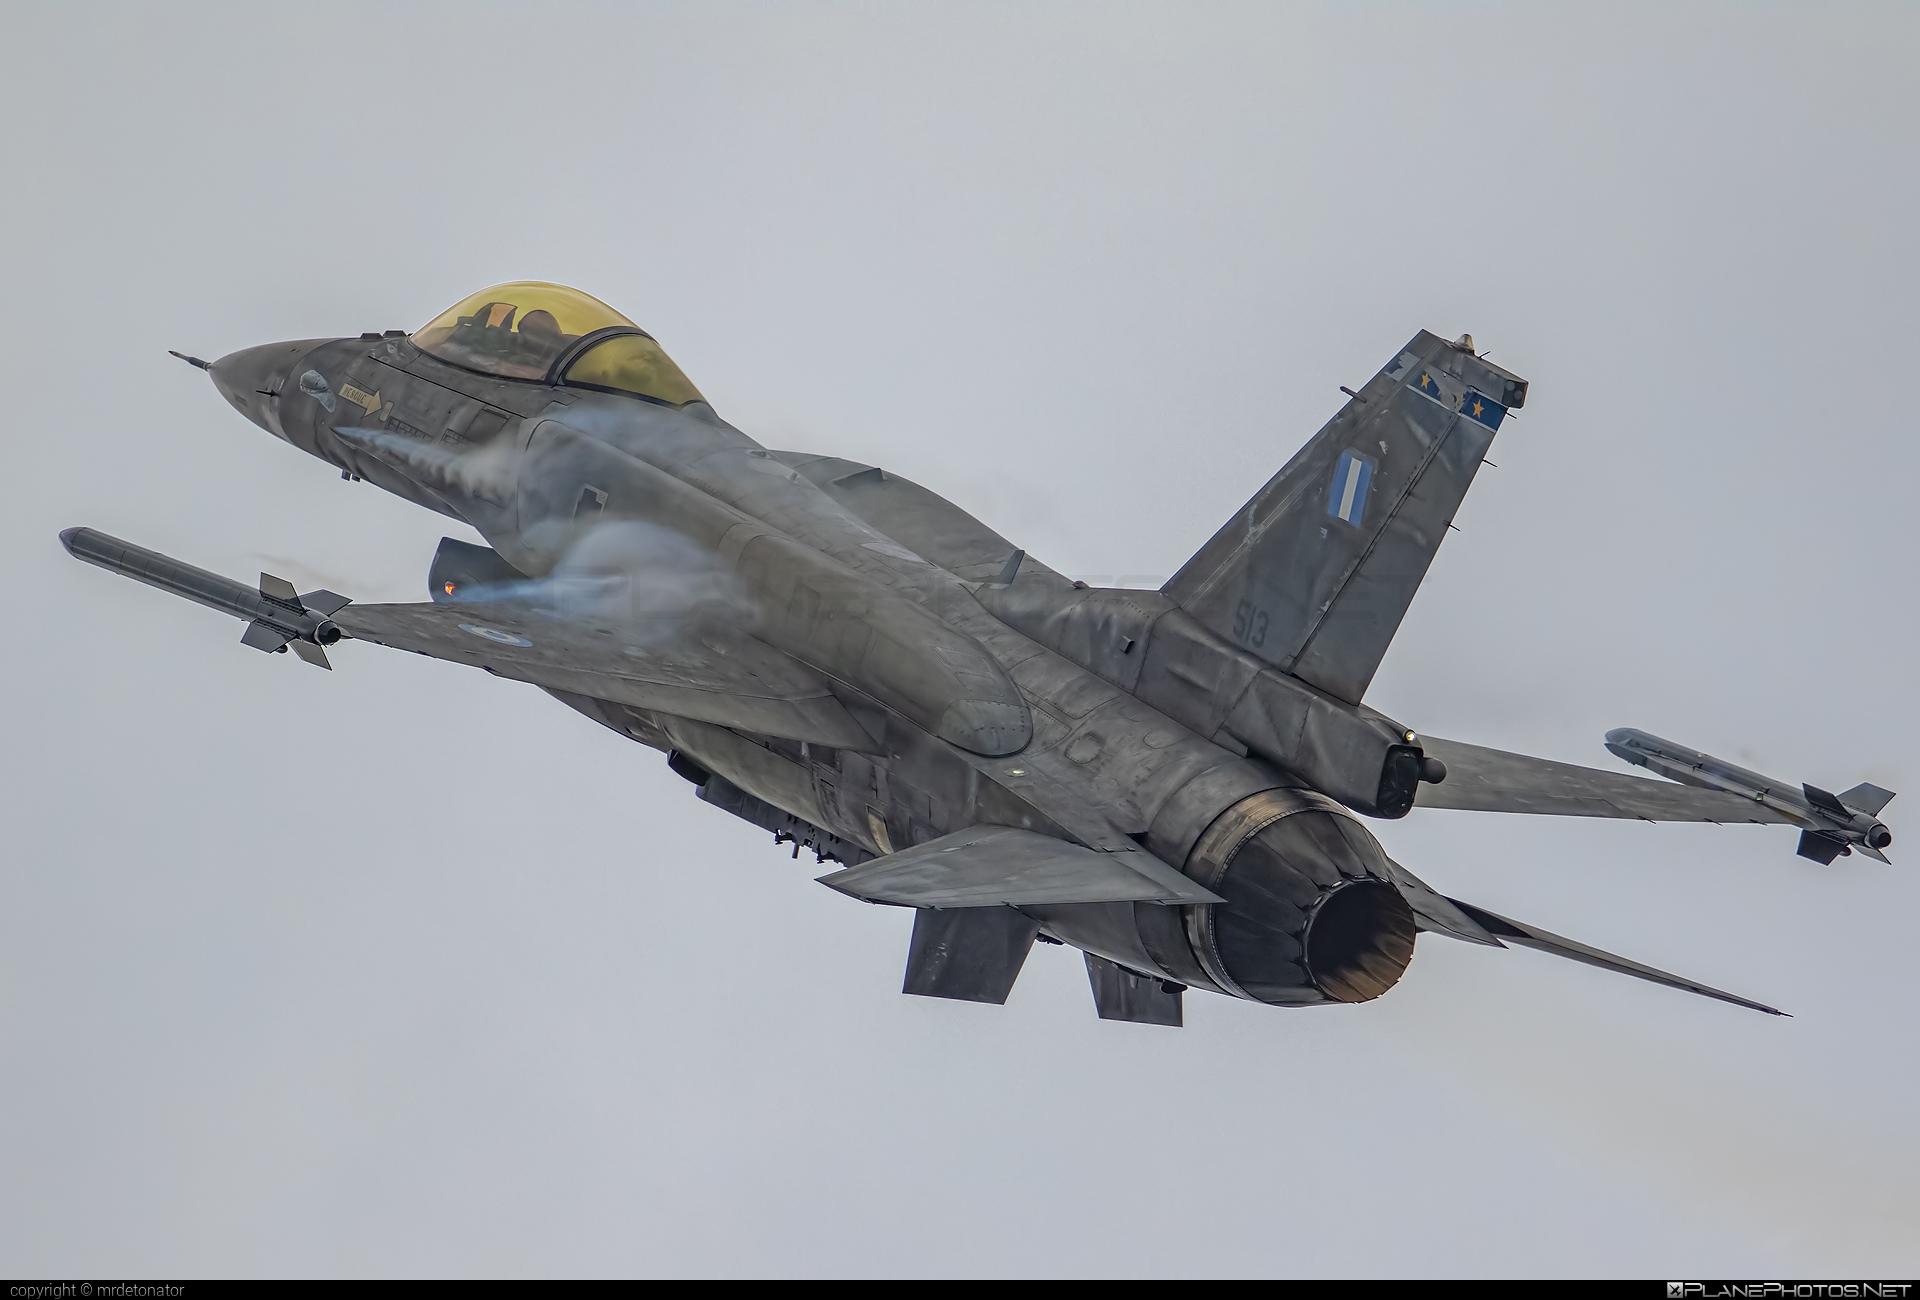 Lockheed Martin F-16CJ Fighting Falcon - 513 operated by Polemikí Aeroporía (Hellenic Air Force) #LockheedMartin #f16 #f16cj #fightingfalcon #hellenicairforce #polemikiaeroporia